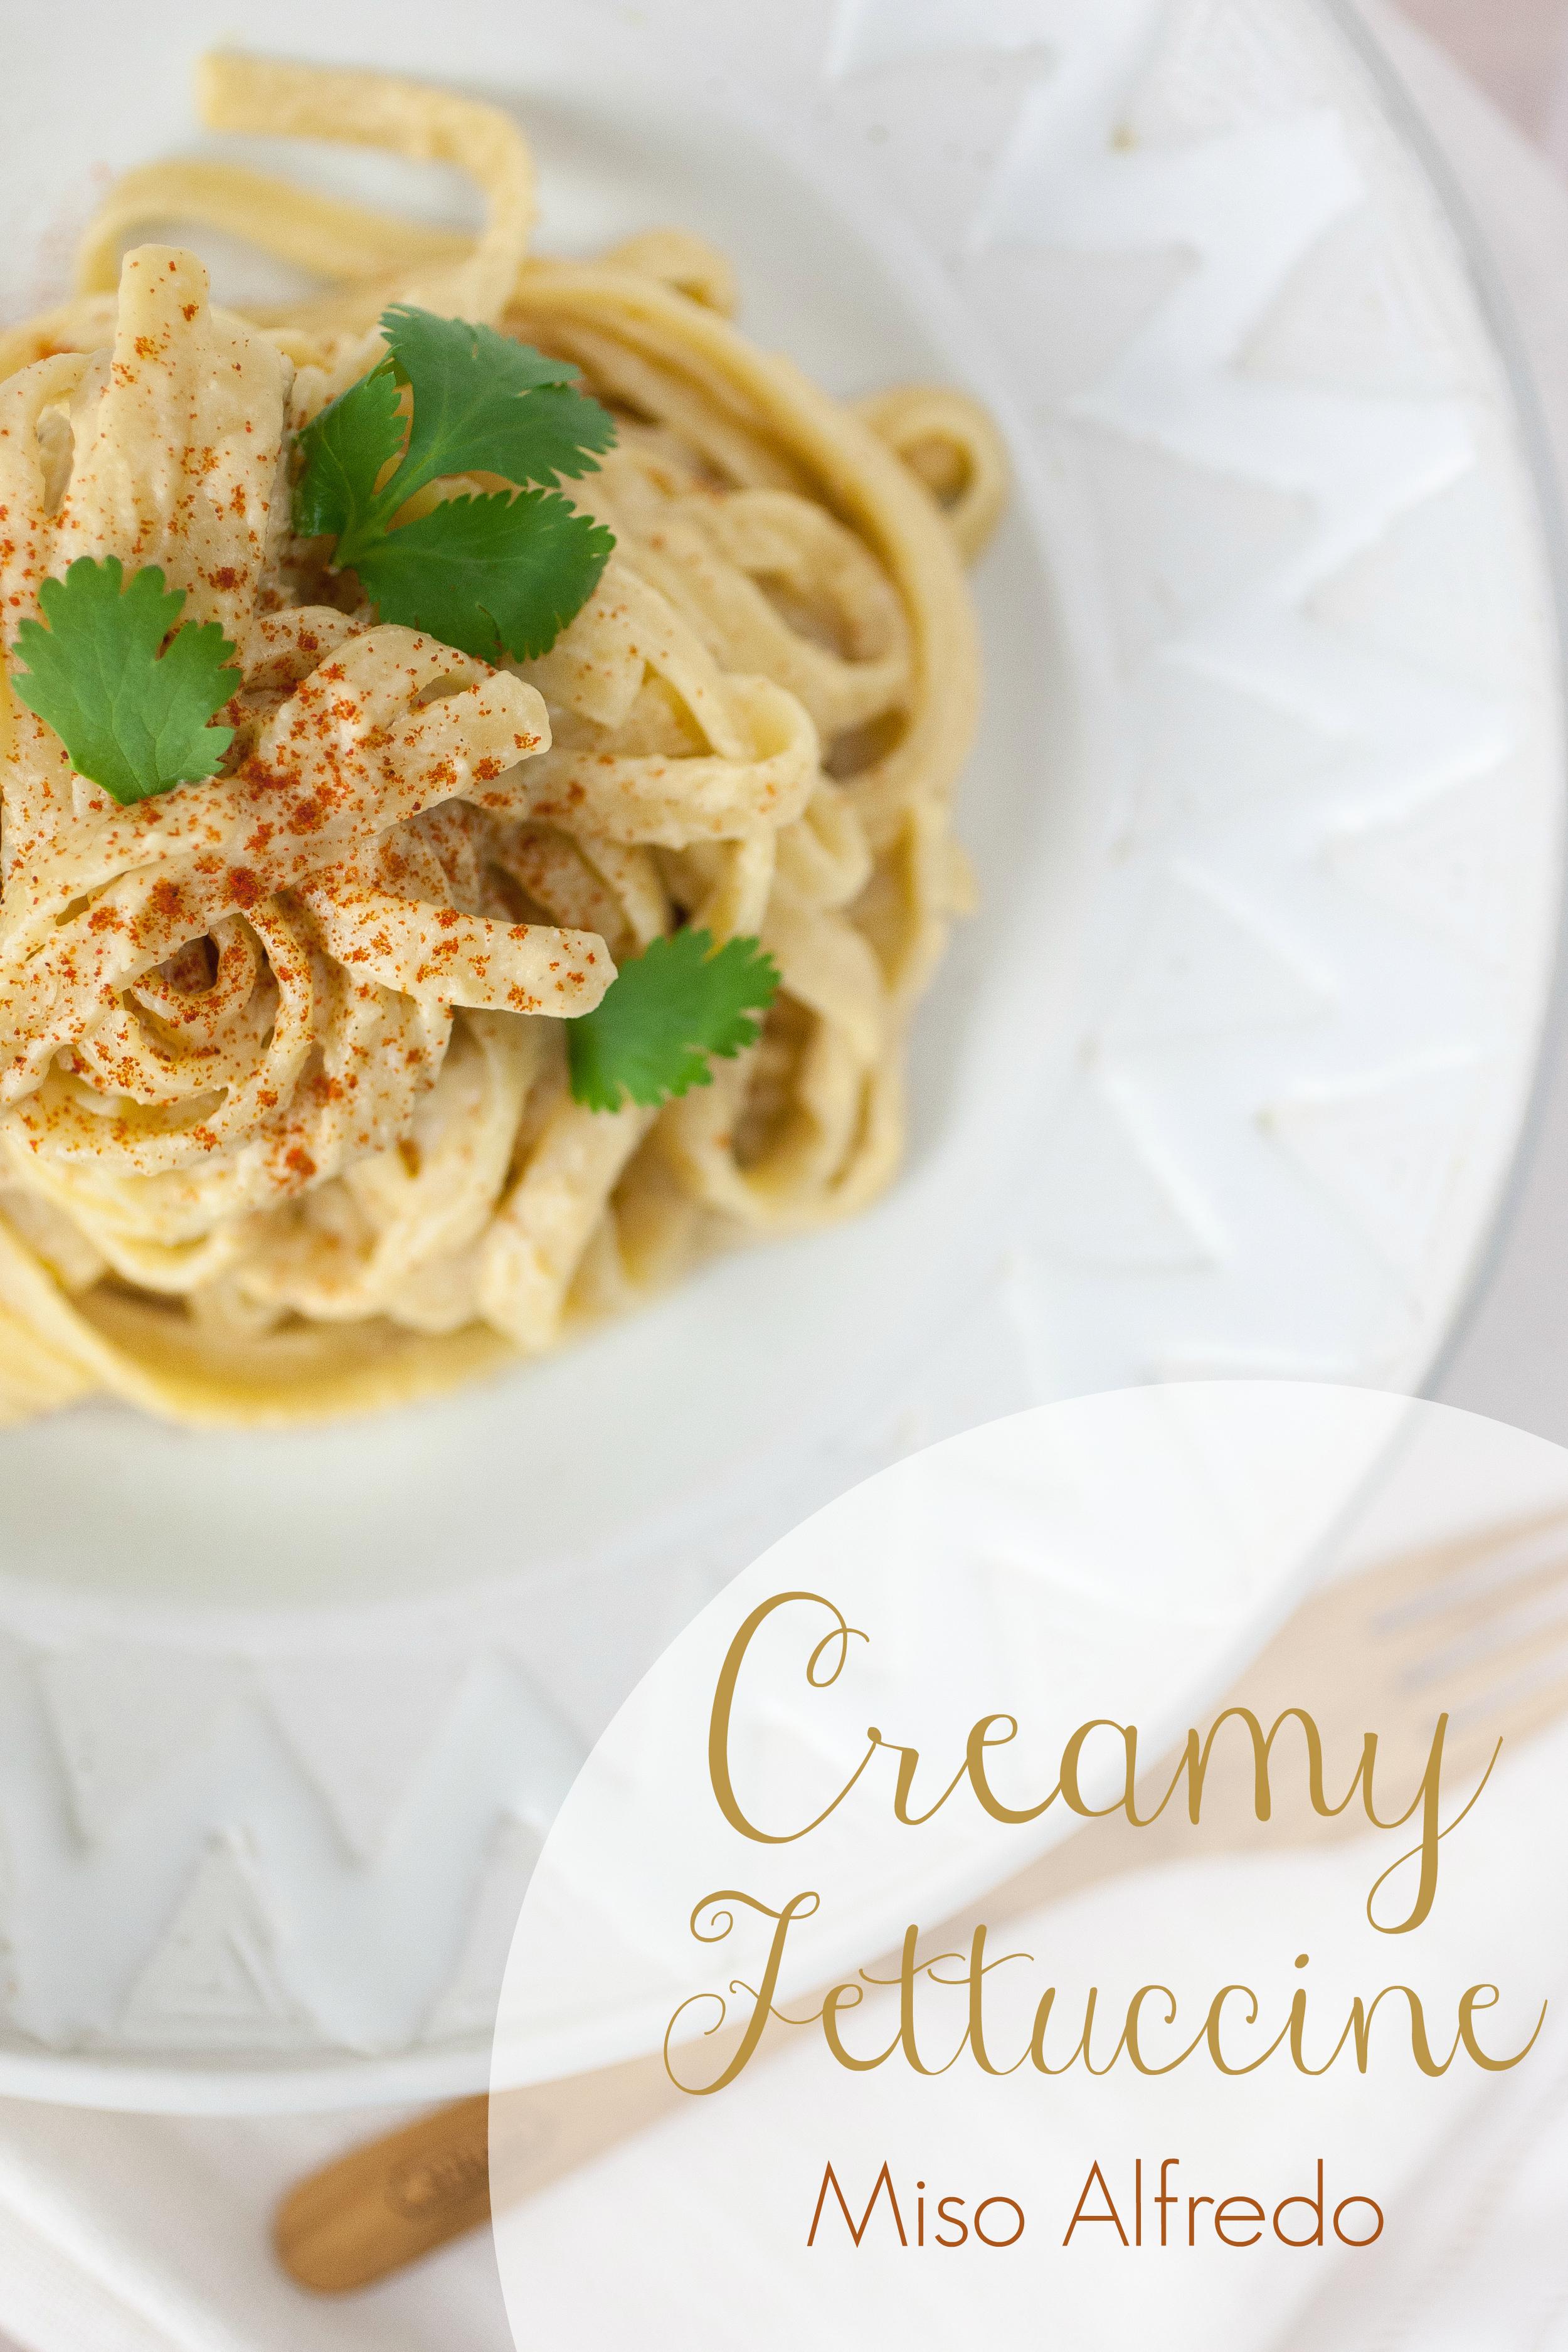 Produce On Parade - Creamy Fettuccine Miso Alfredo